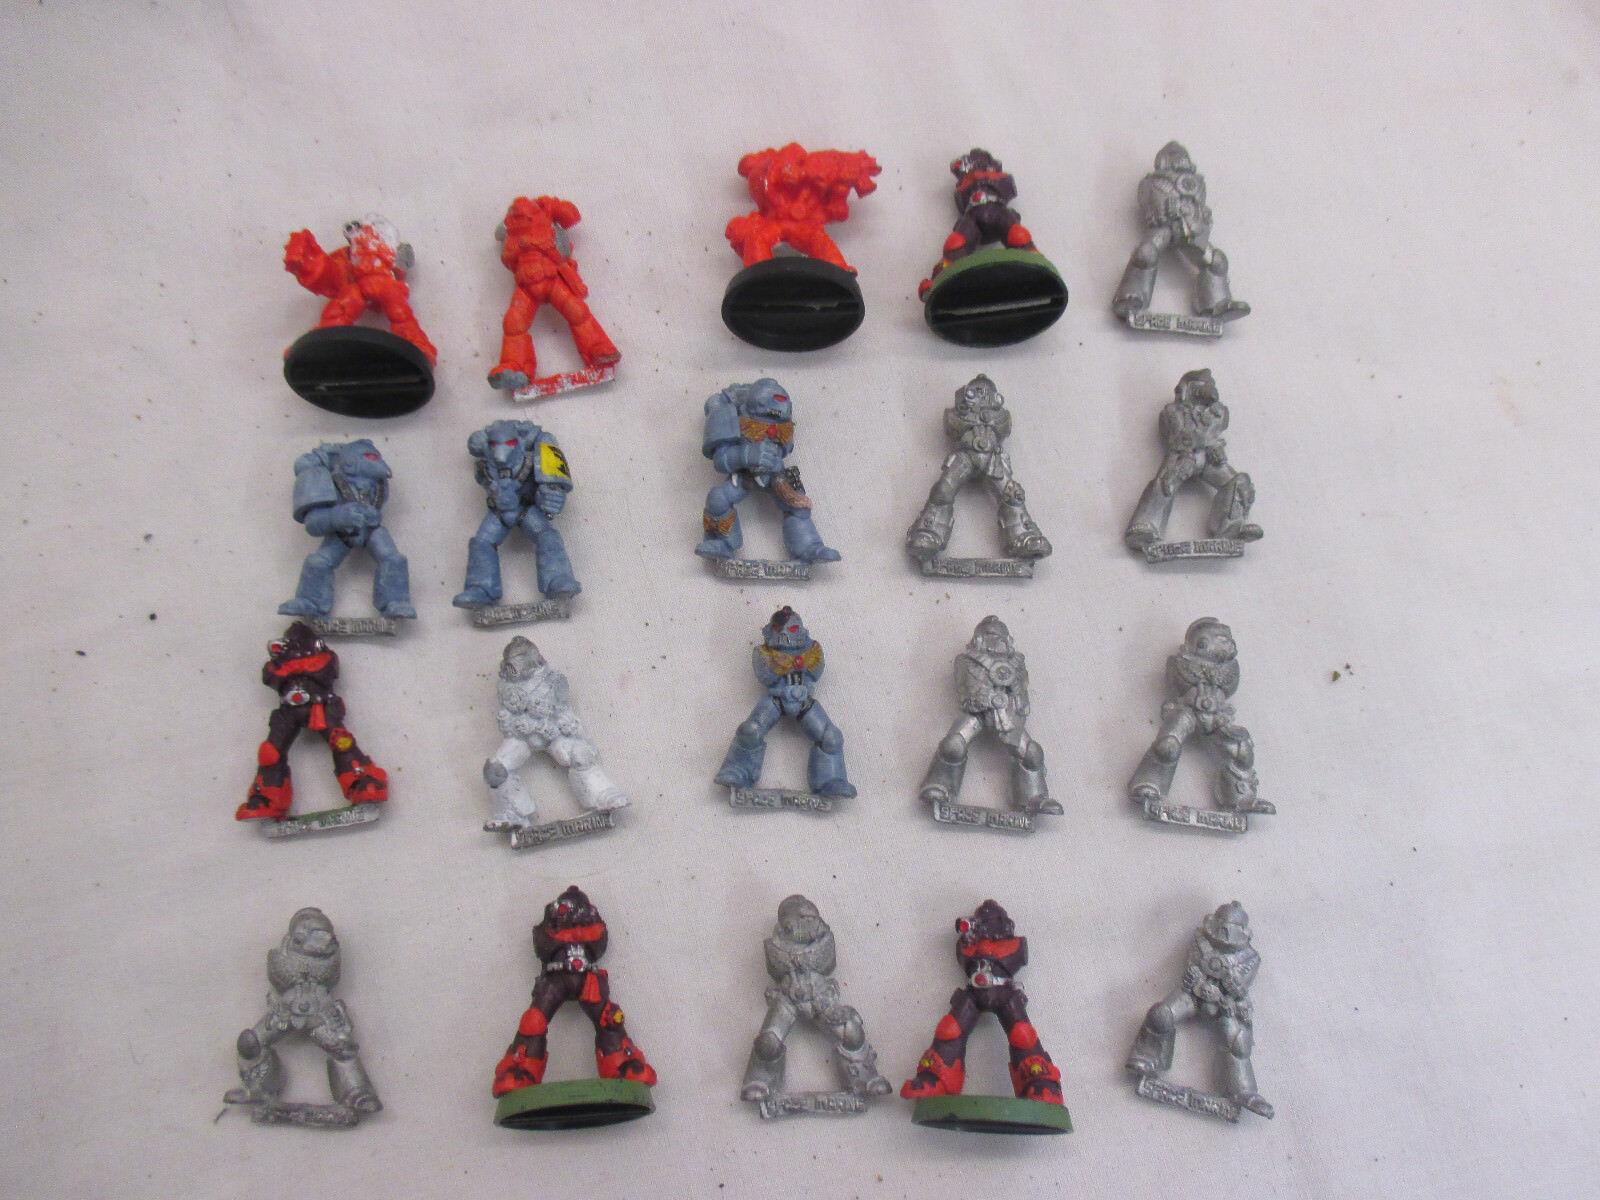 20 x Warhammer 40k red Trader Space Marine Metal - Part & Unpainted